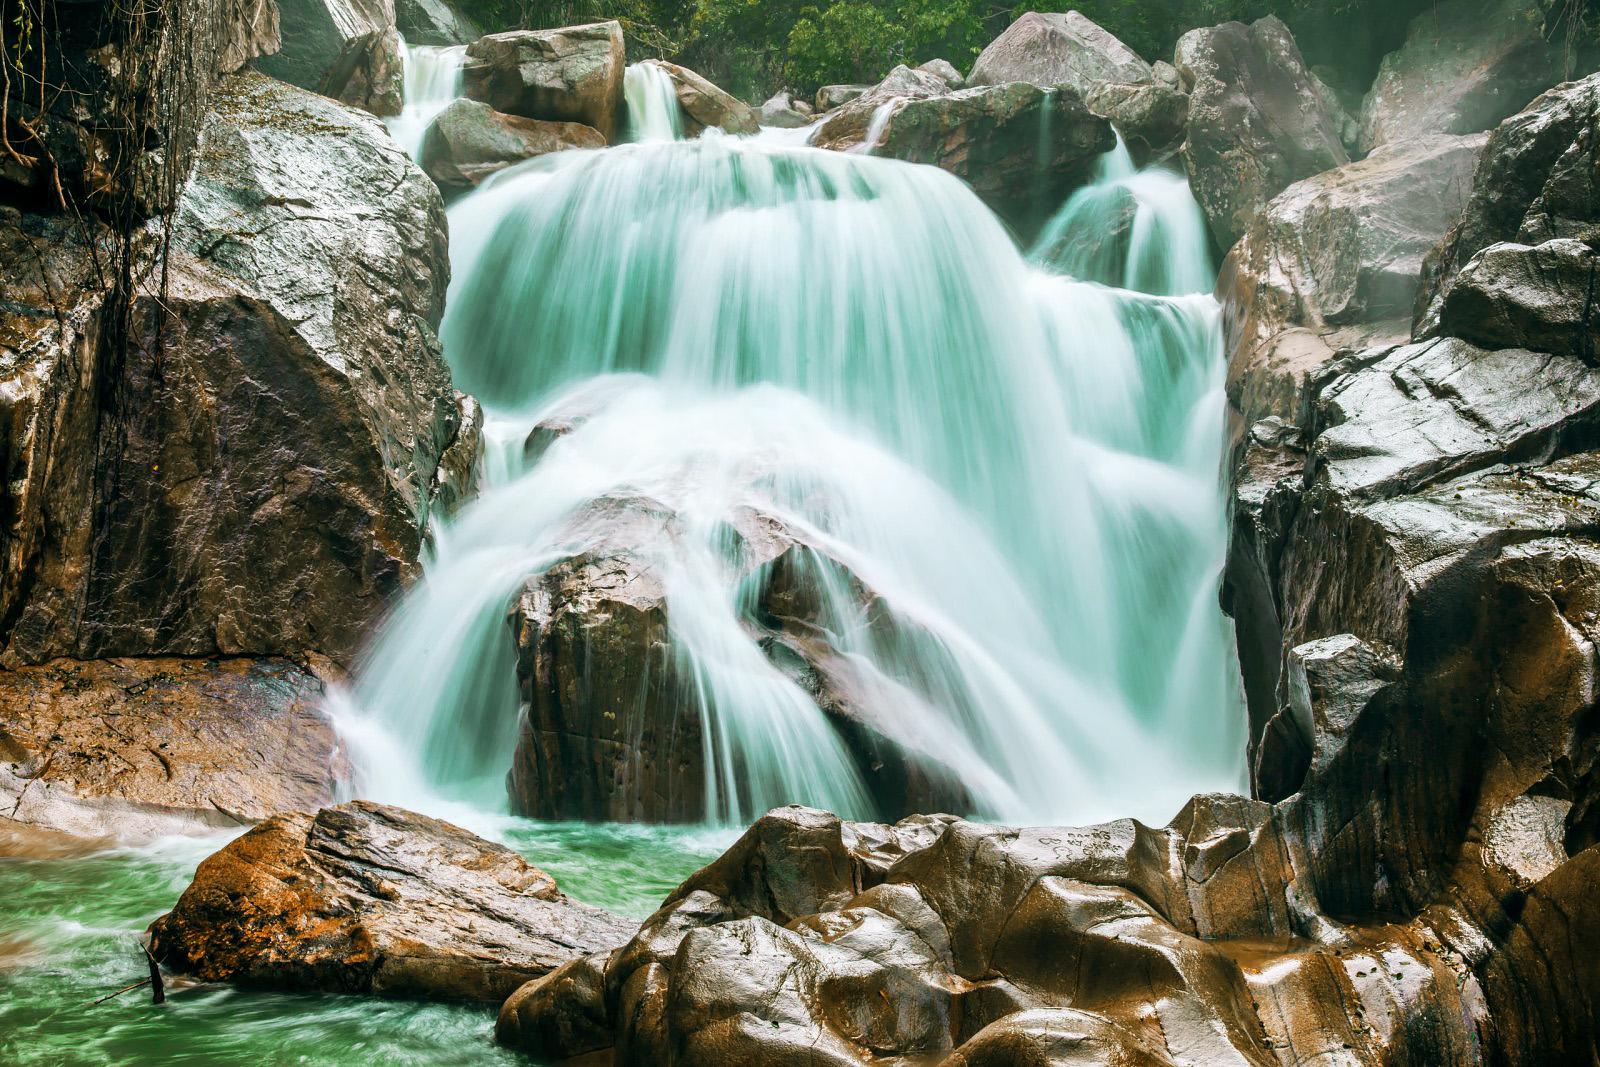 8 крутых природных мест Вьетнама 8 крутых природных мест Вьетнама bahofalls